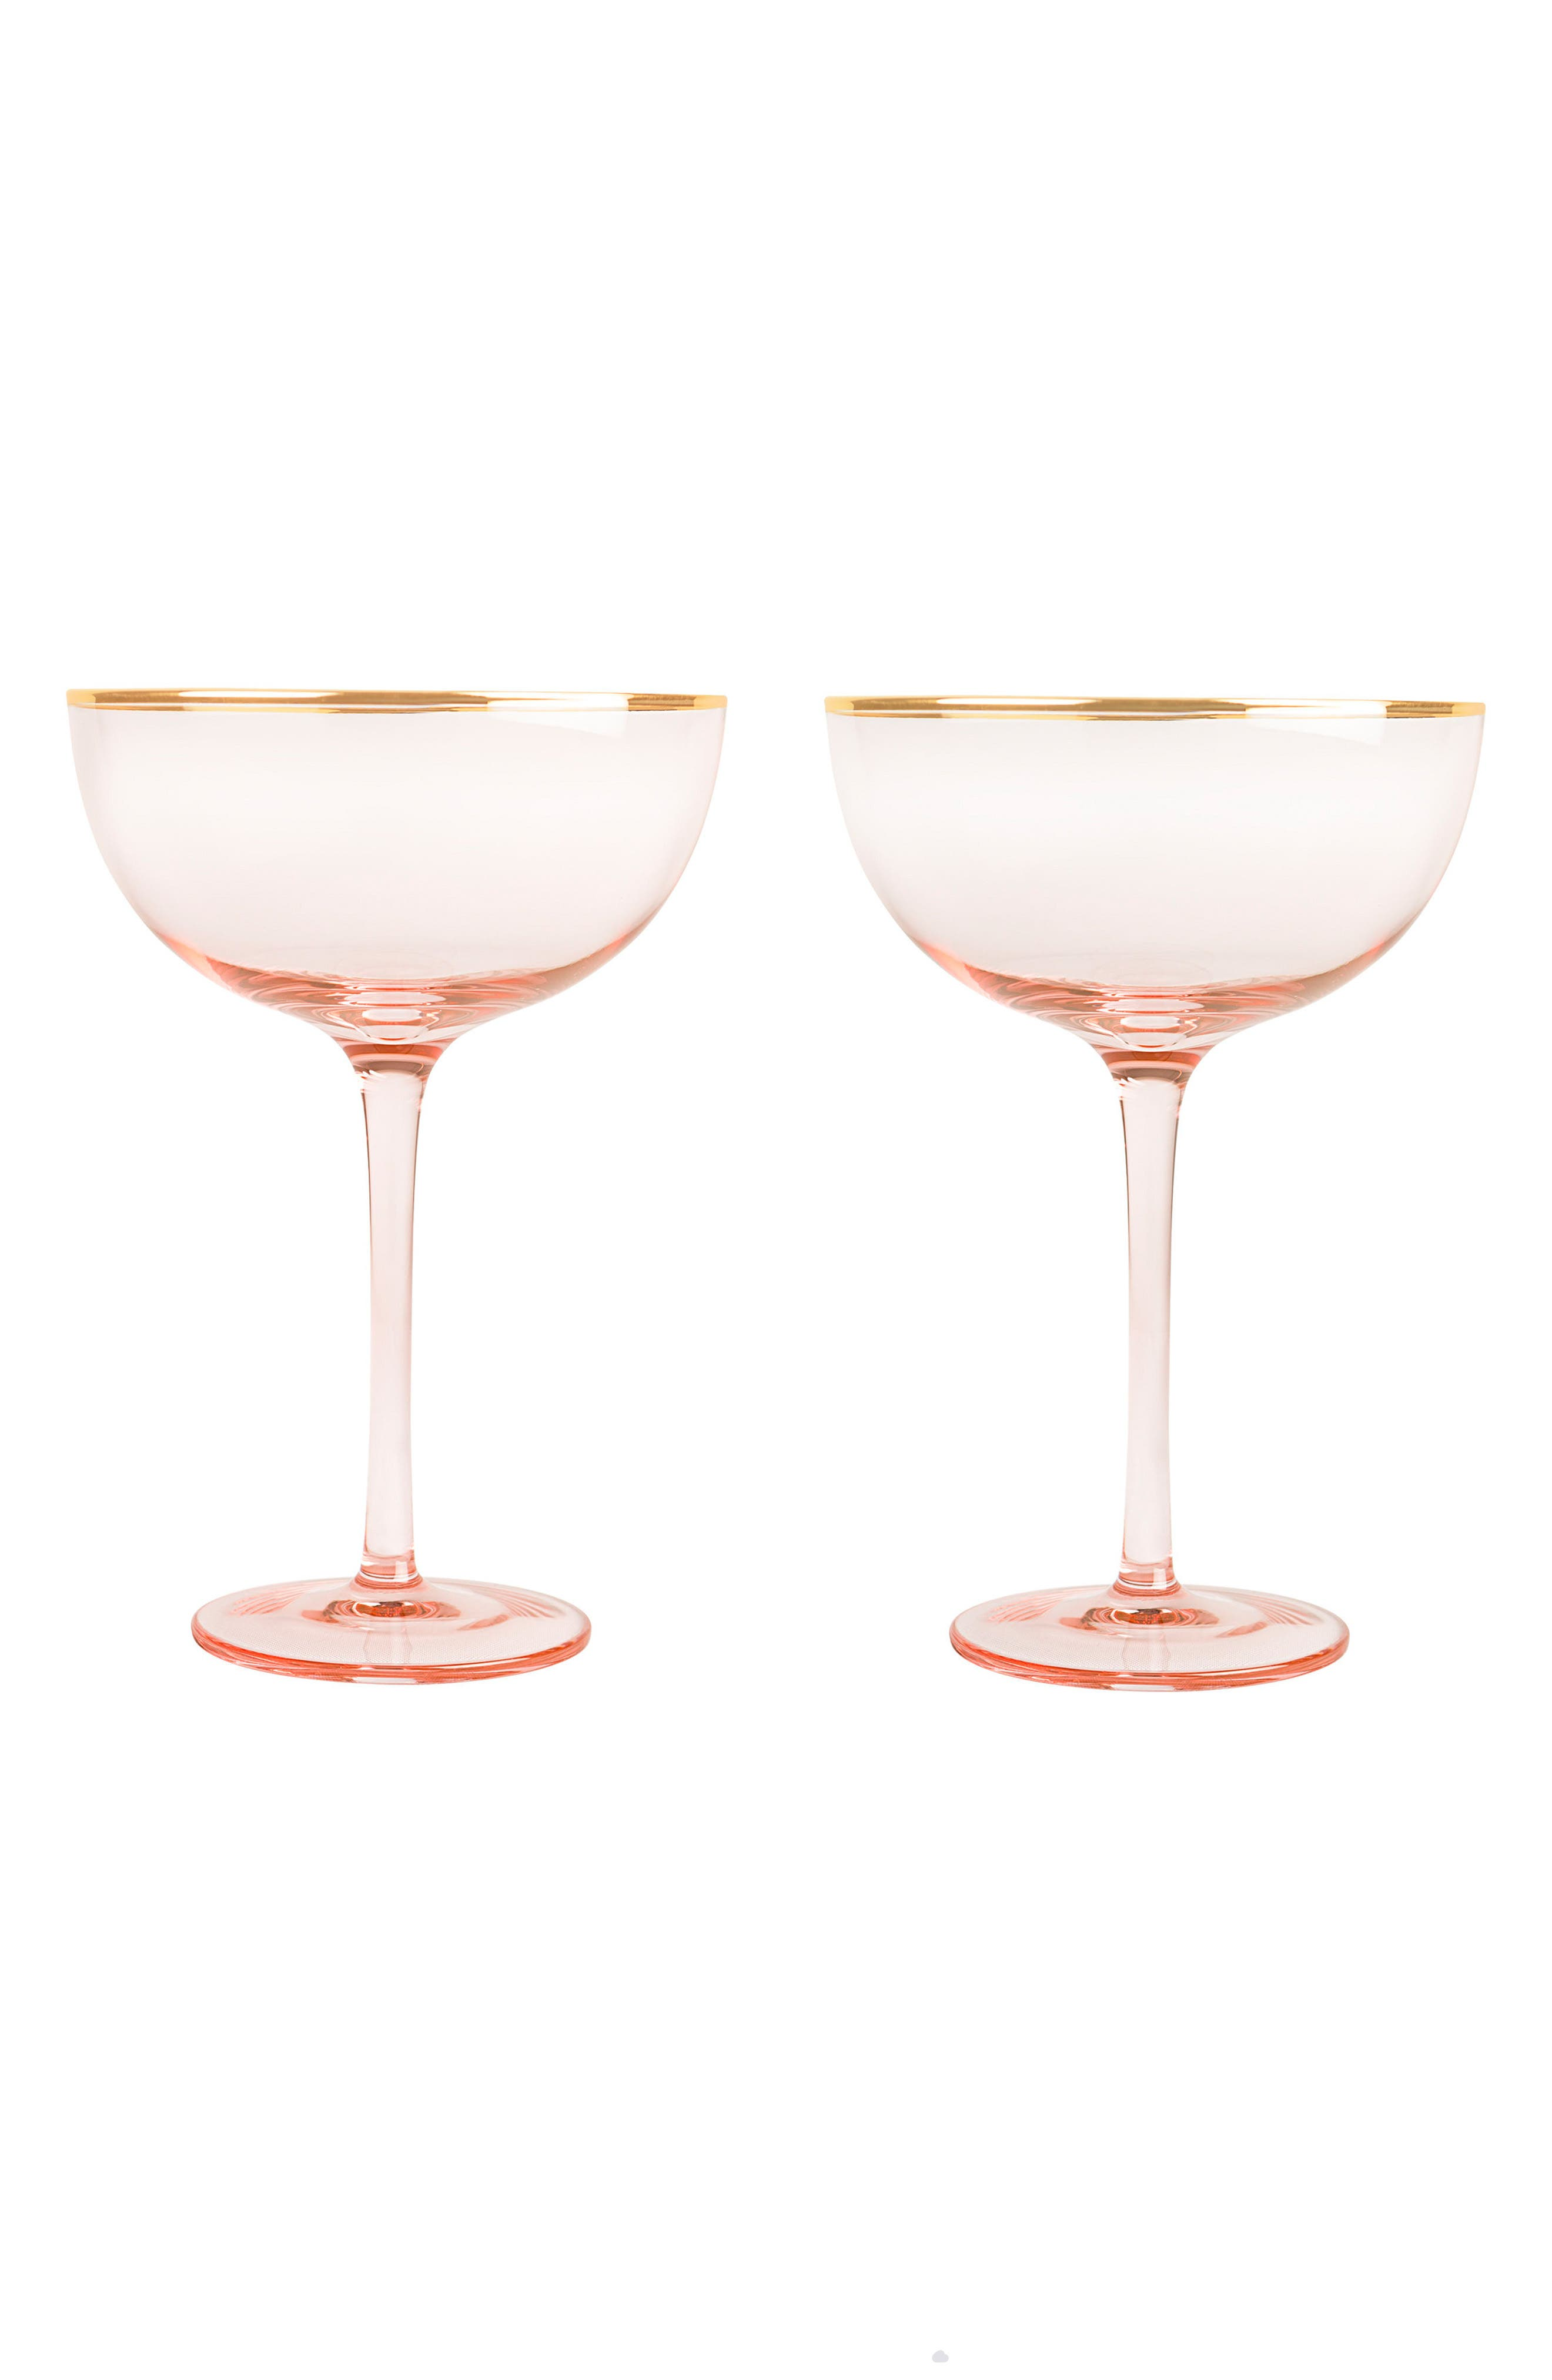 Monogram Set of 2 Champagne Coupes,                         Main,                         color, Blush